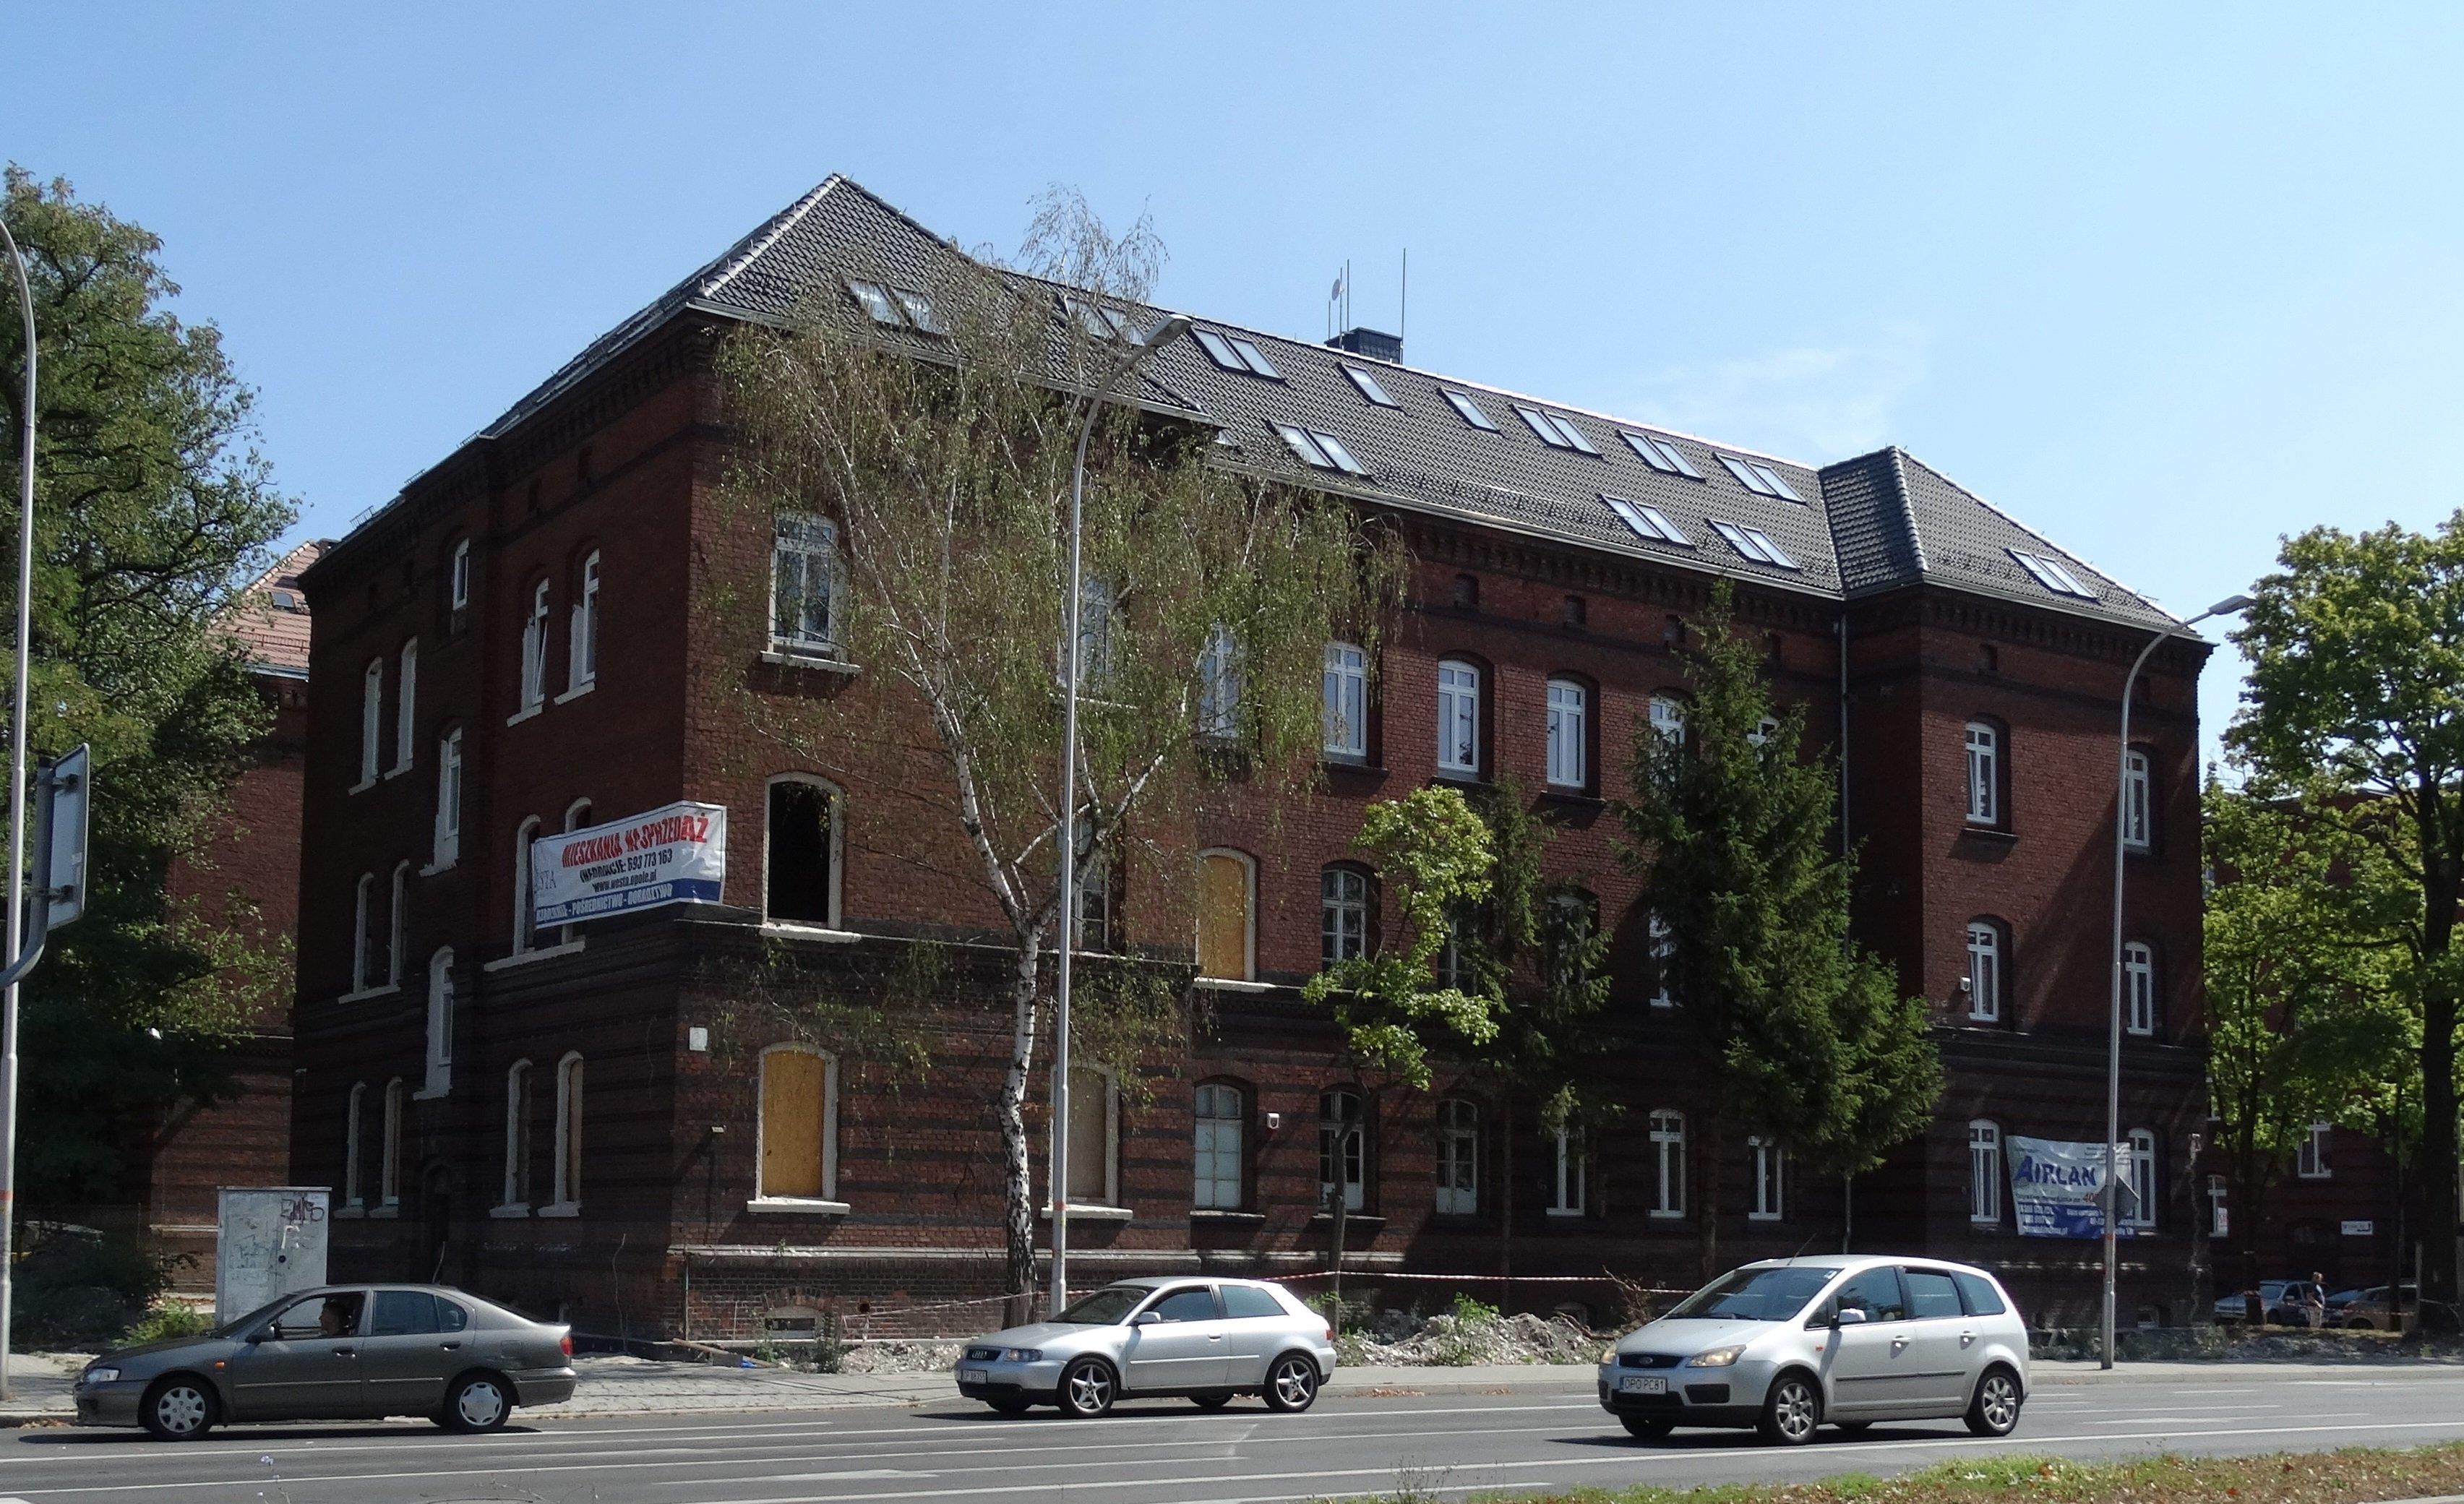 Mieszkanie, 47.7 m2, Opole - Centrum